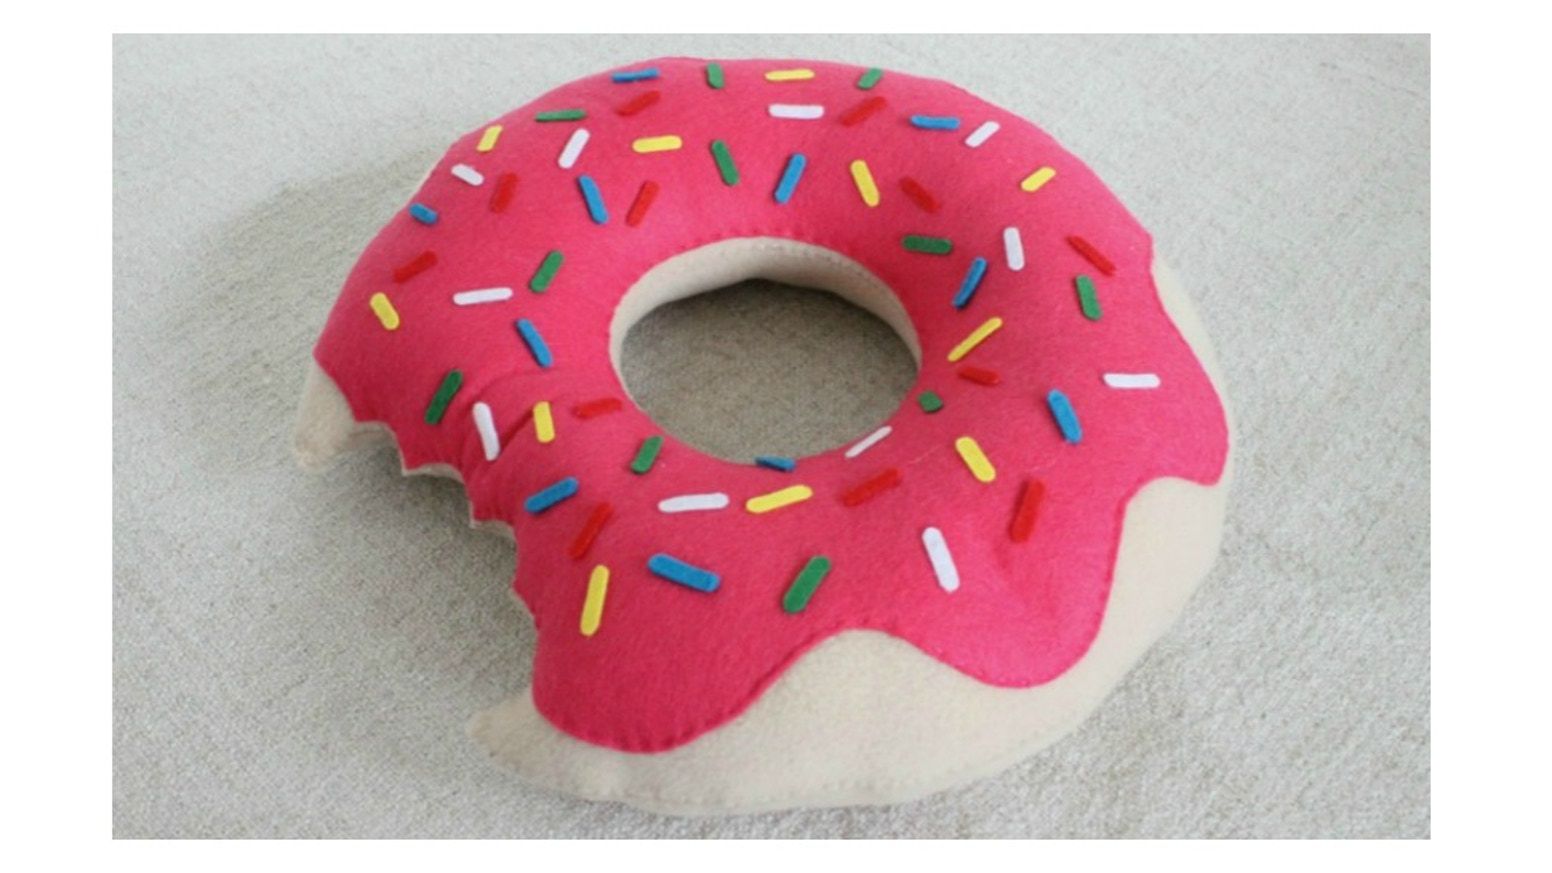 Delicious Handmade Doughnut Pillows For Christmas Fair By